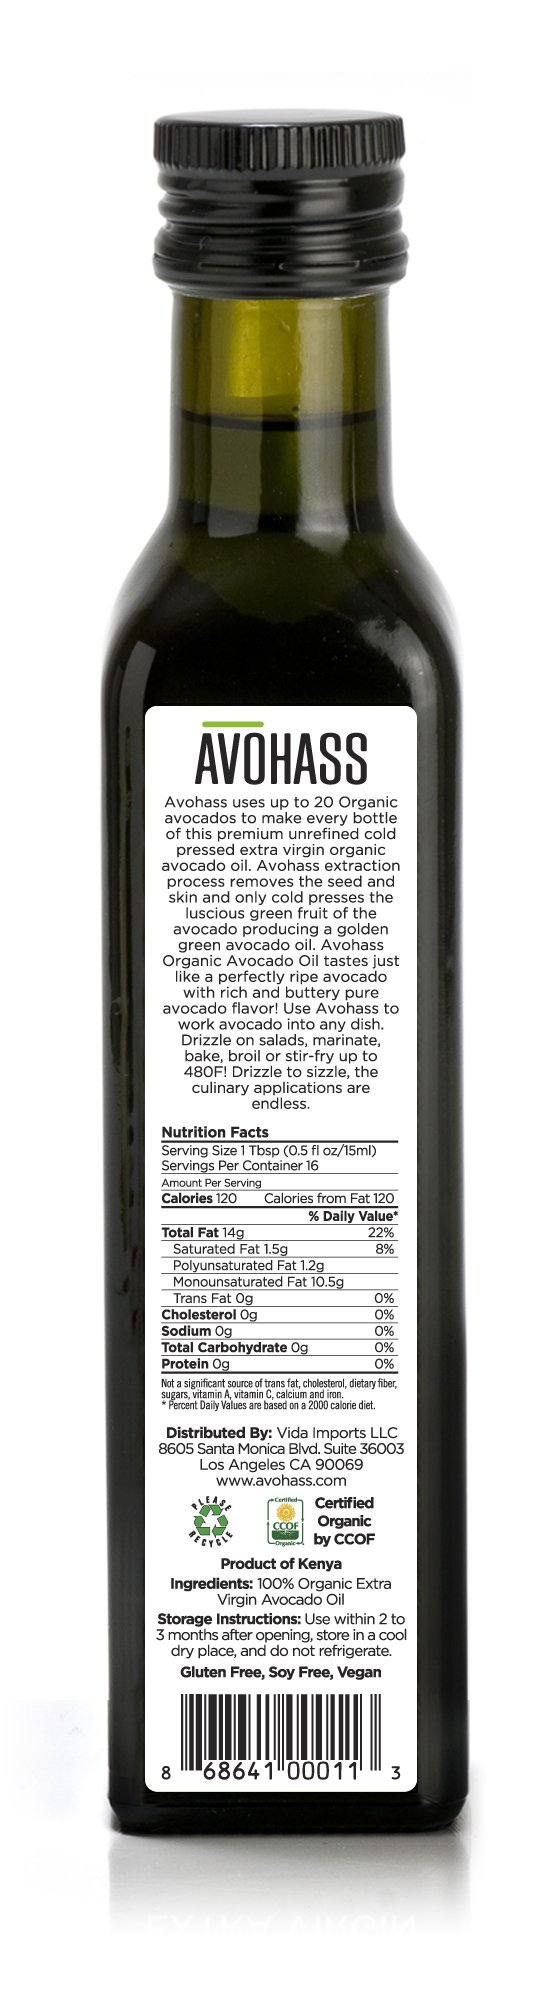 Avohass California Organic Extra Virgin Avocado Oil 2 Bottle Case by AVOHASS (Image #2)